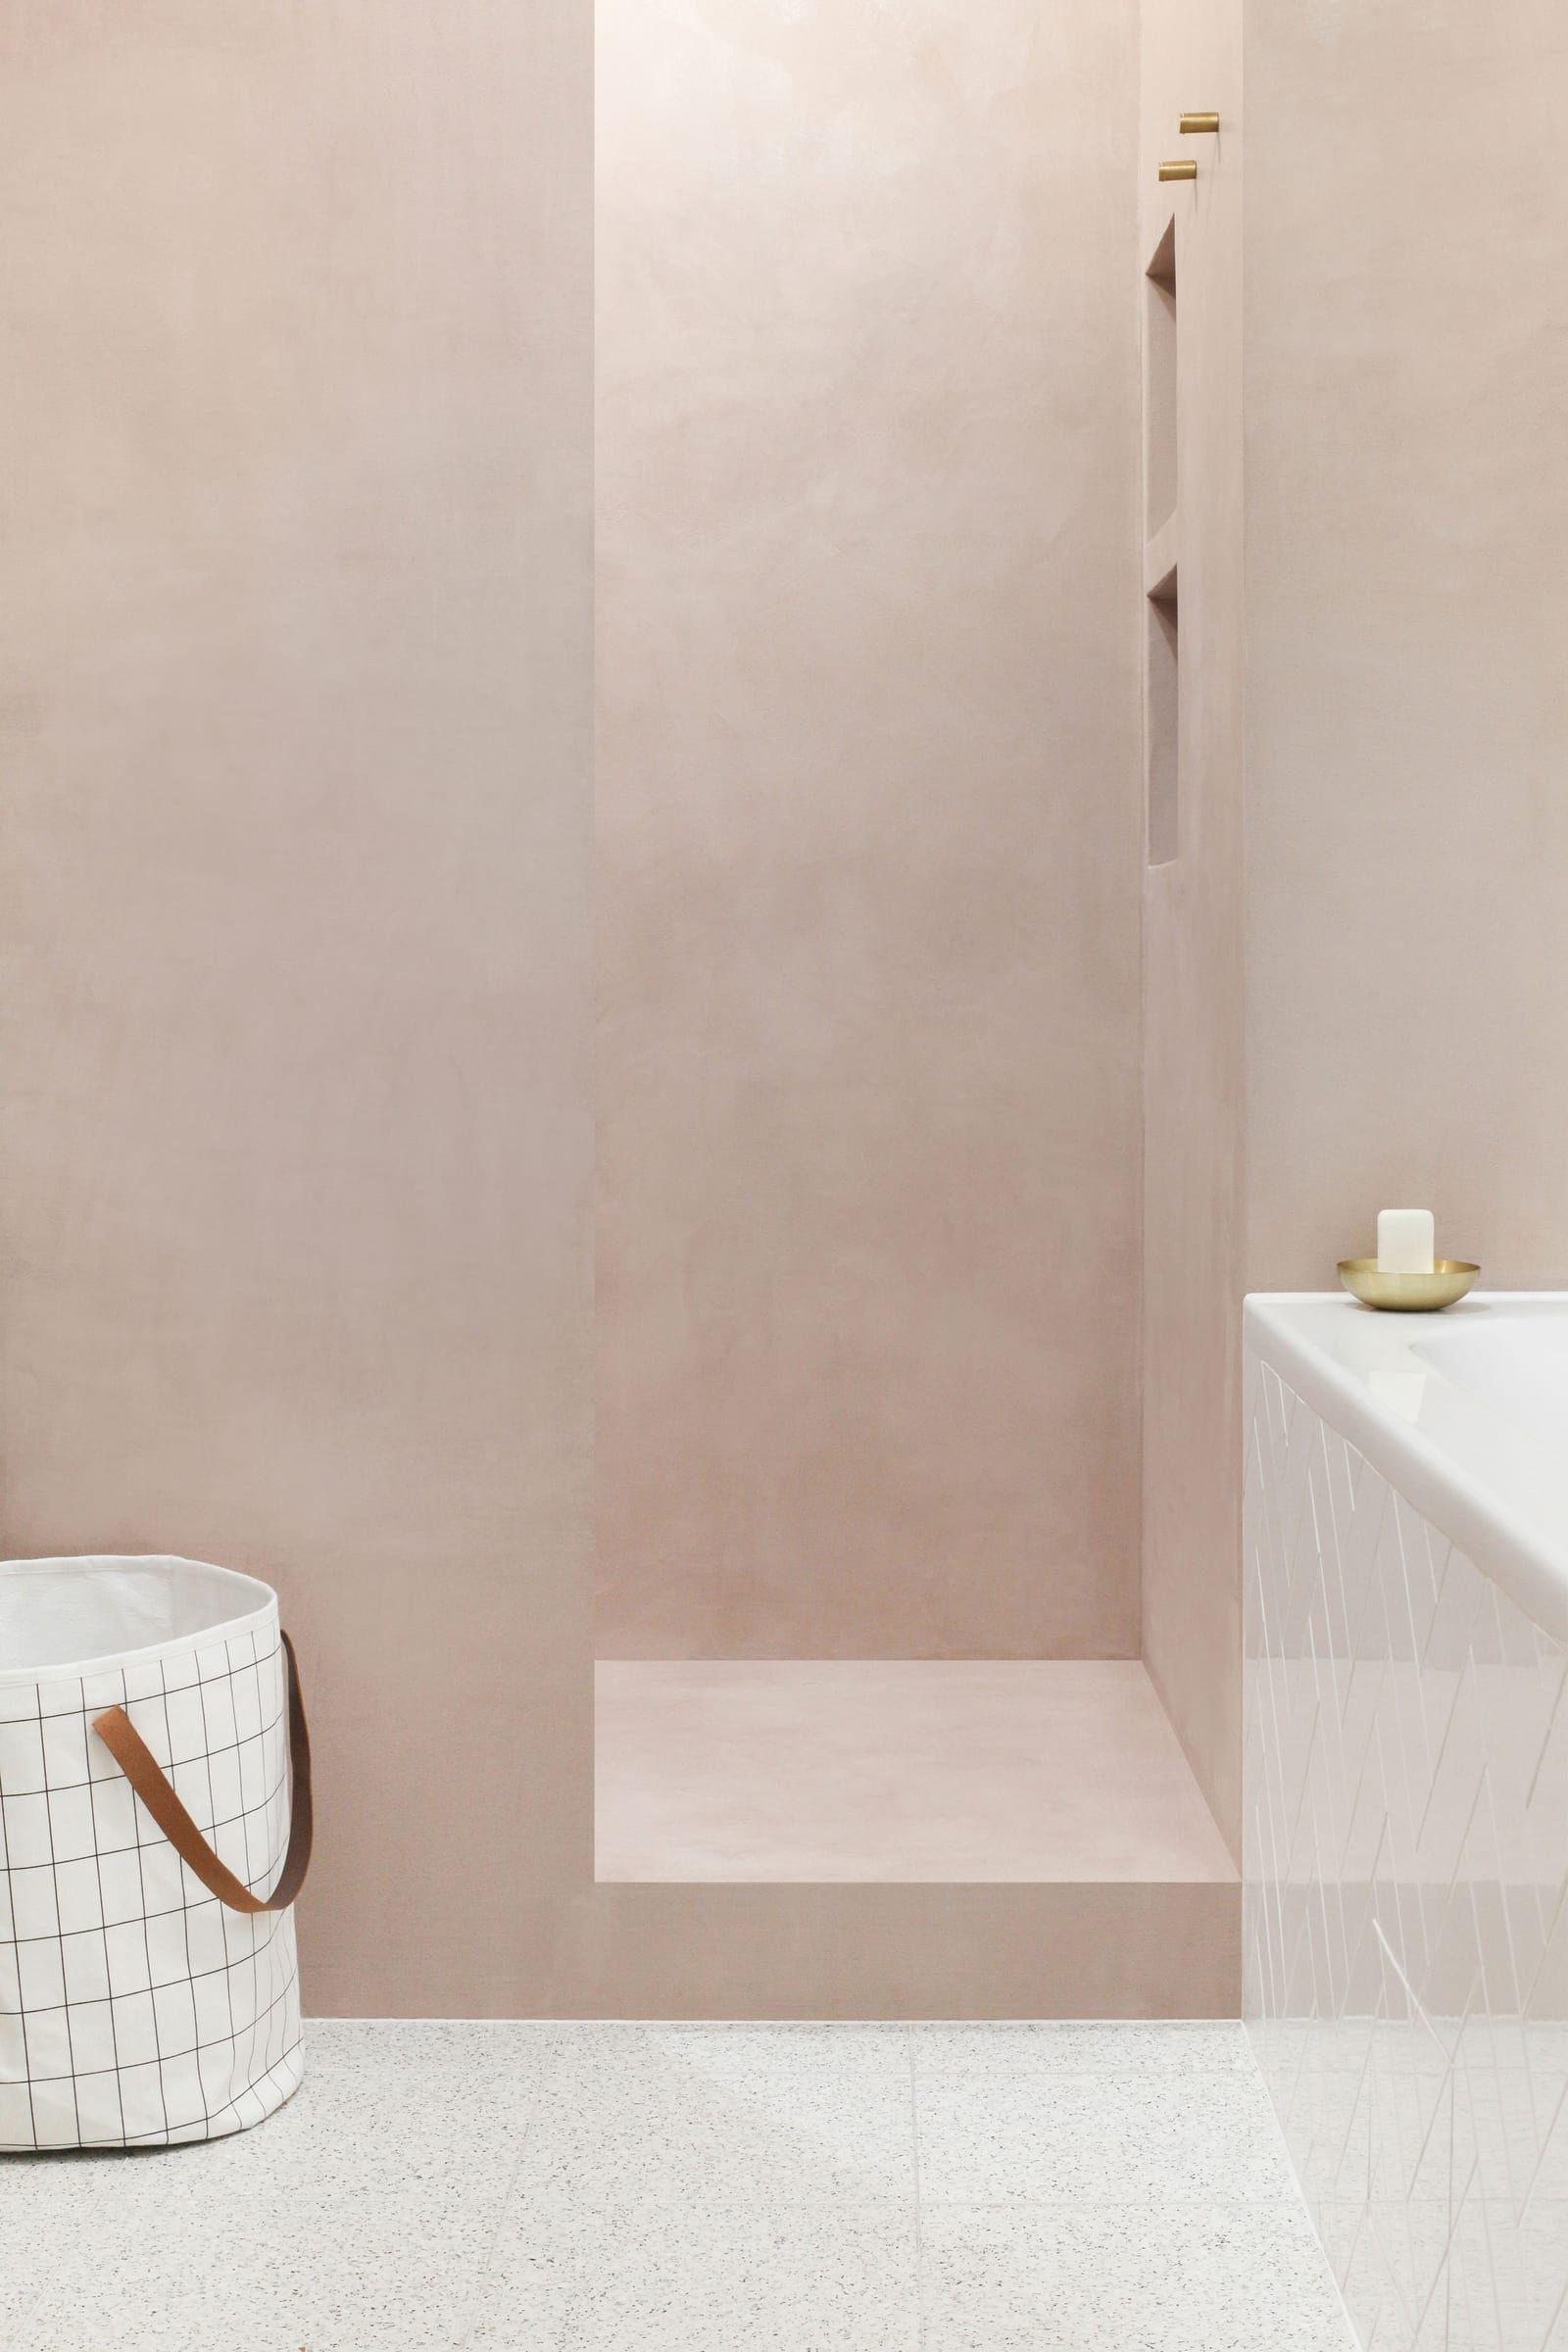 Appartement Valmy Par Heju En 2020 Remodeler La Douche Idee